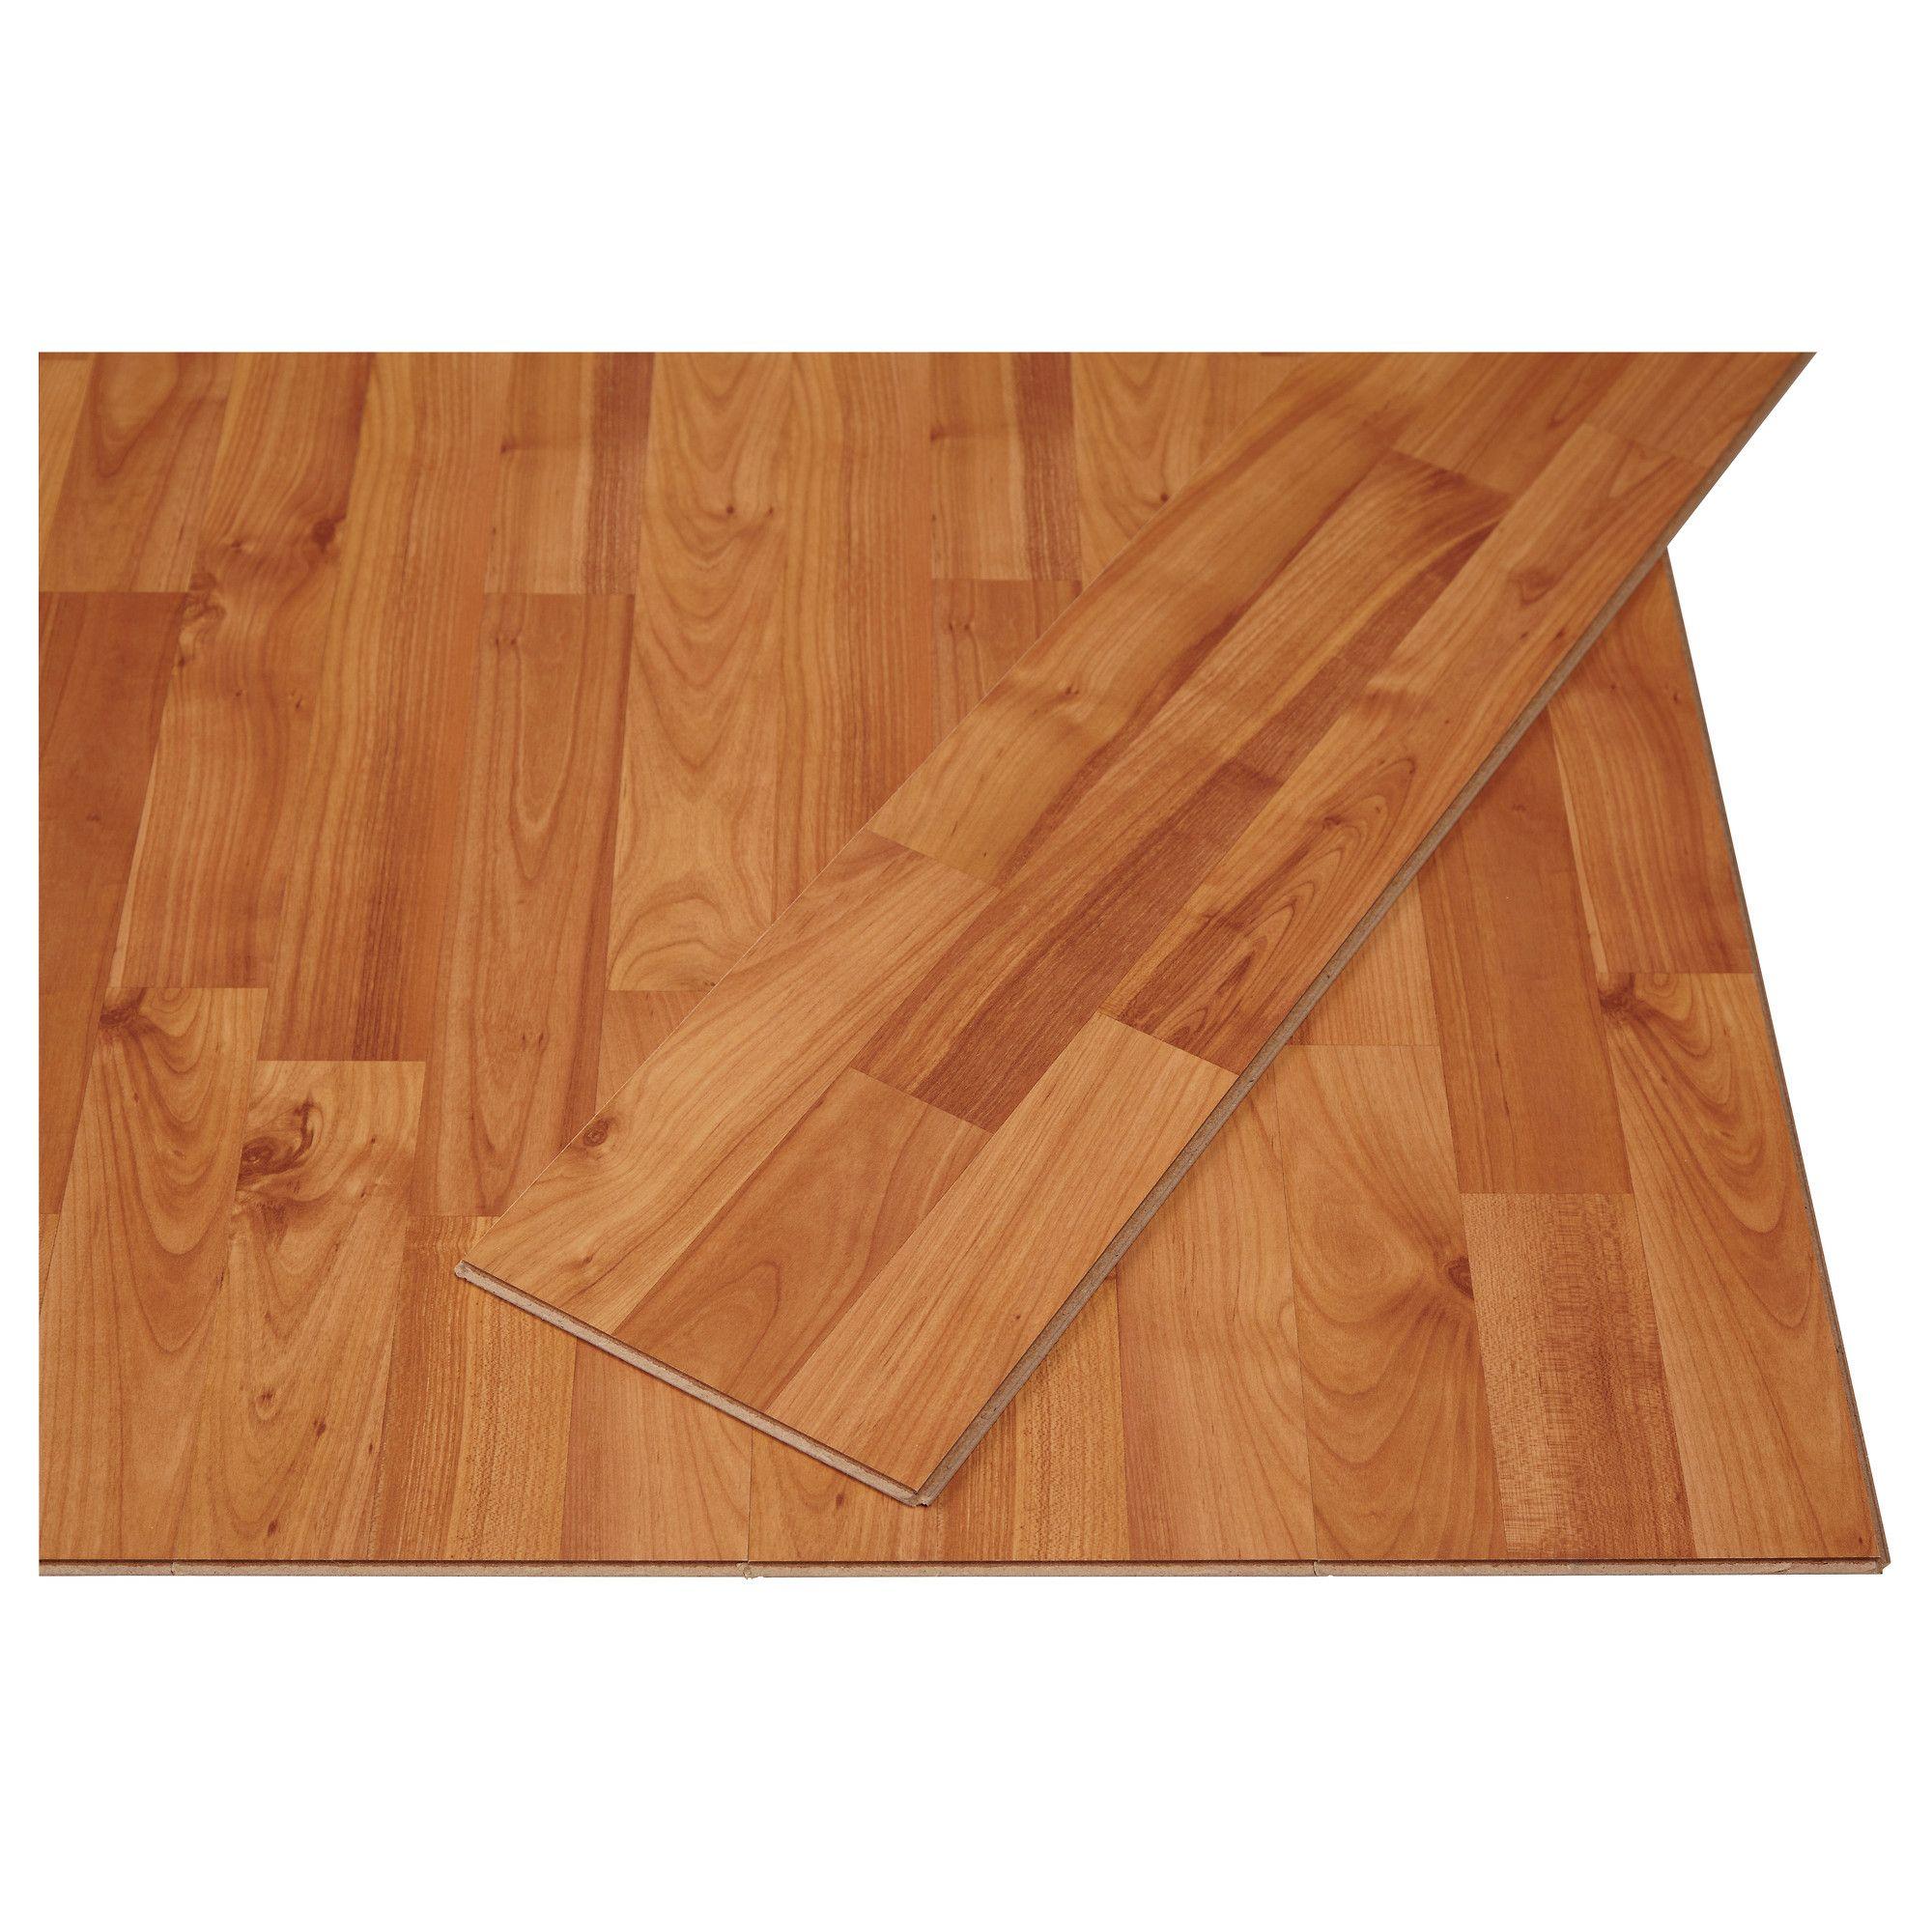 Tundra laminated flooring alder effect ikea for the for Ikea tundra